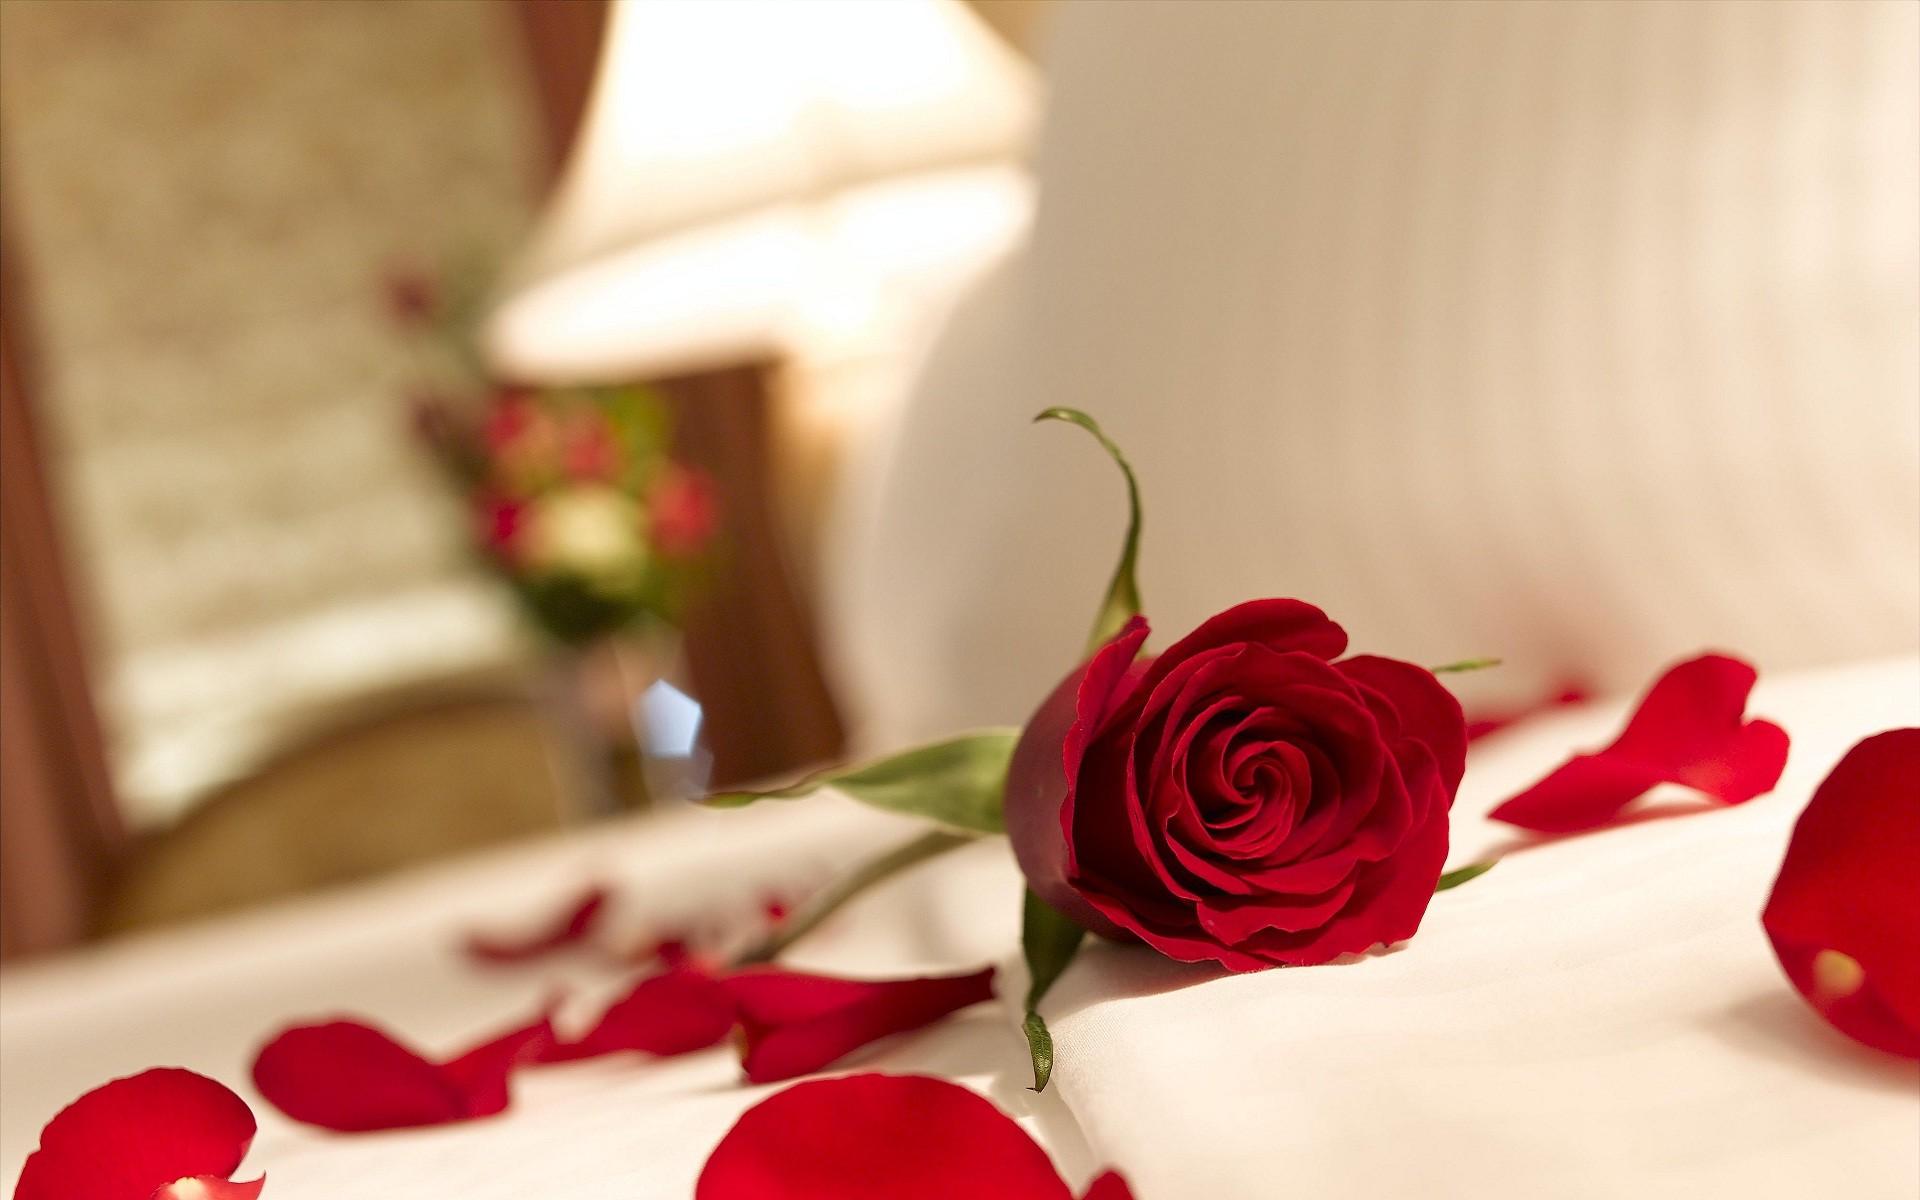 Red rose love wallpaper 55 images - Y k love wallpaper ...